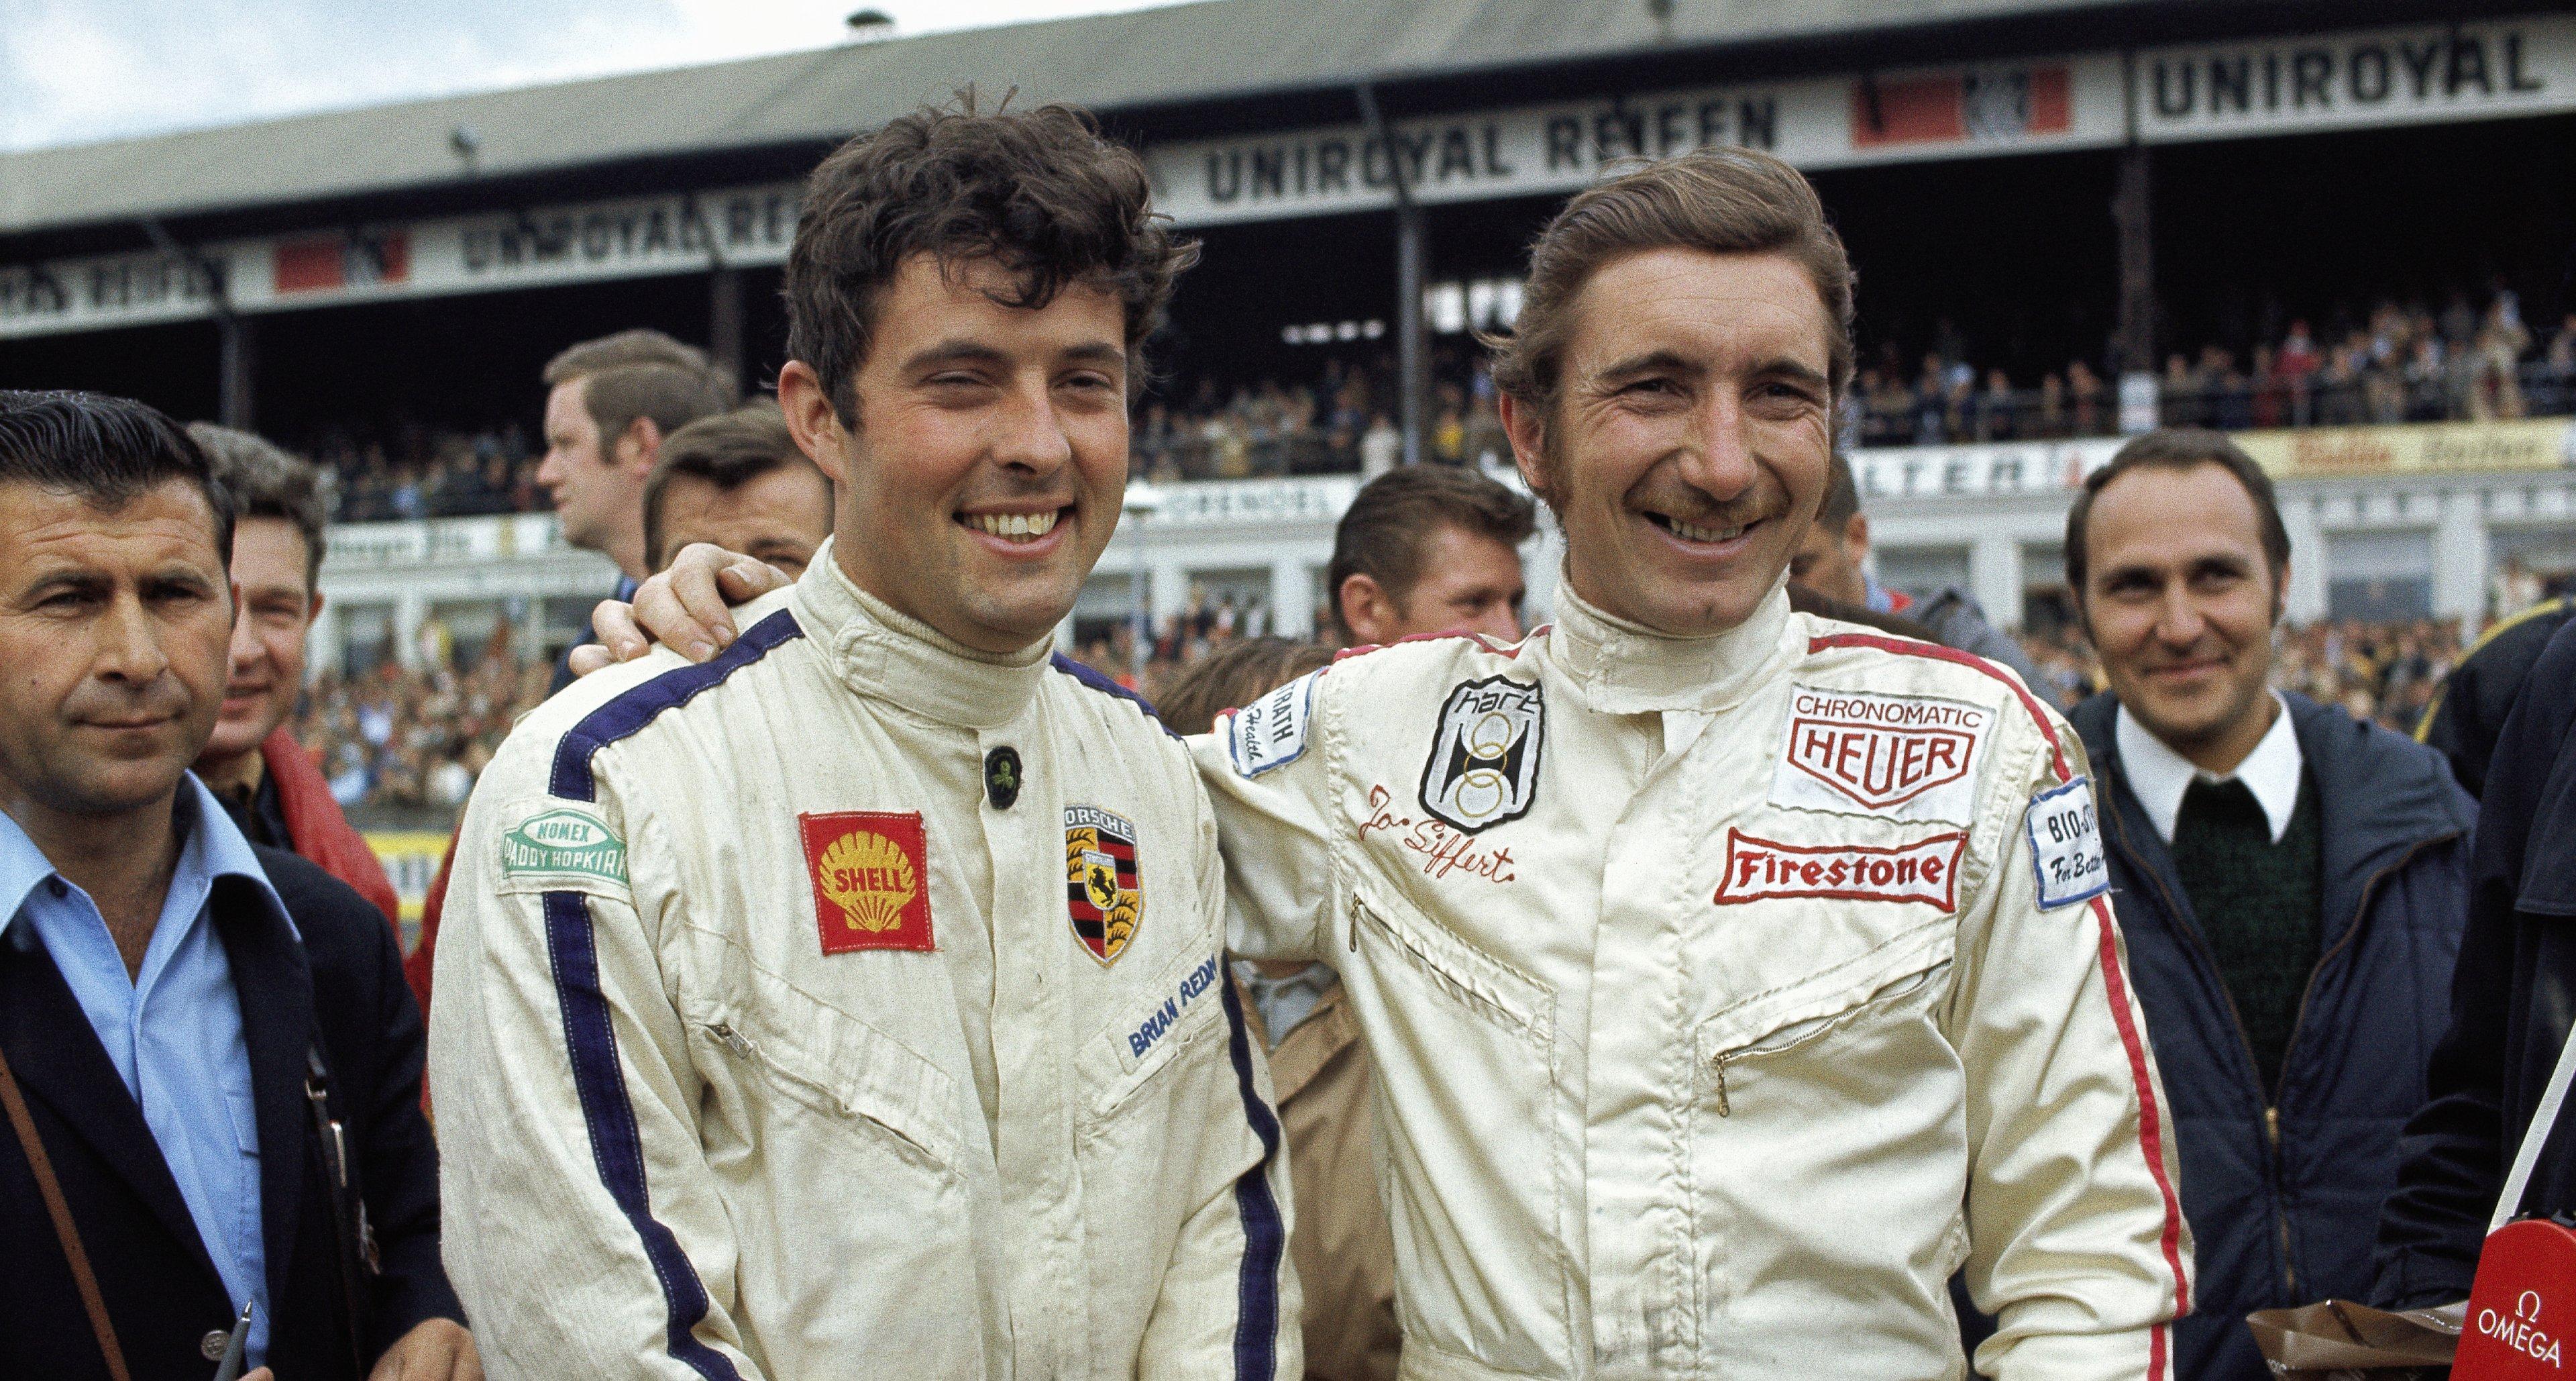 Porsche team-mates Brian Redman and Jo Siffert, 1000 km Nuerburgring 1969, Nuerburgring, Germany, 01 June 1969.